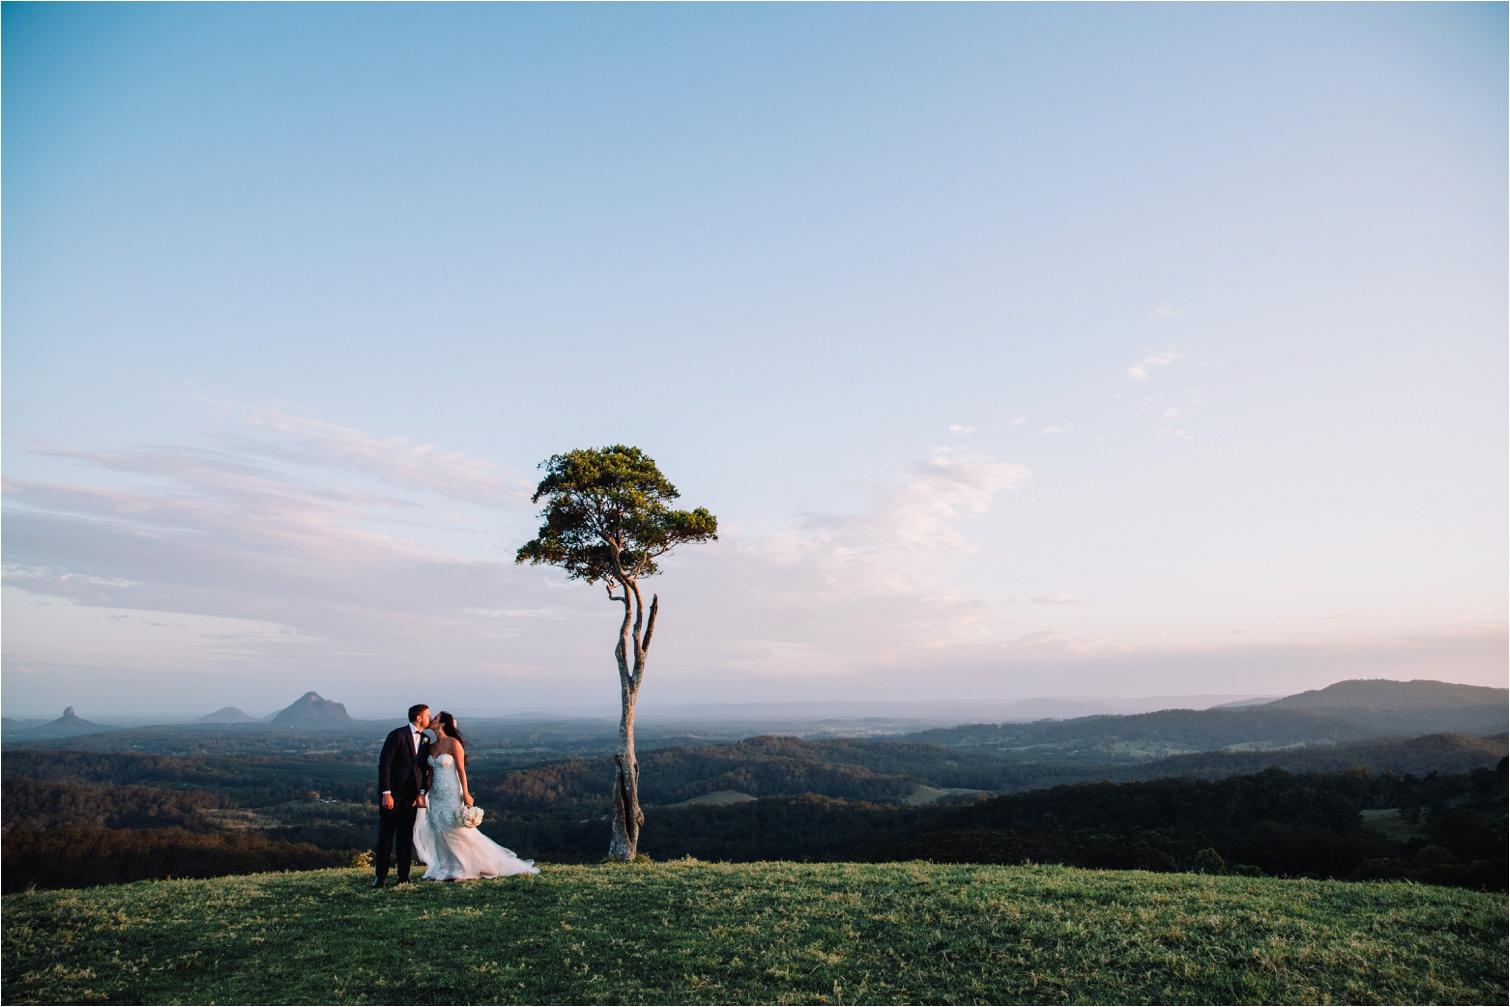 Maleny Manor Wedding Photography - Gold Coast Wedding Photographer_0046.jpg